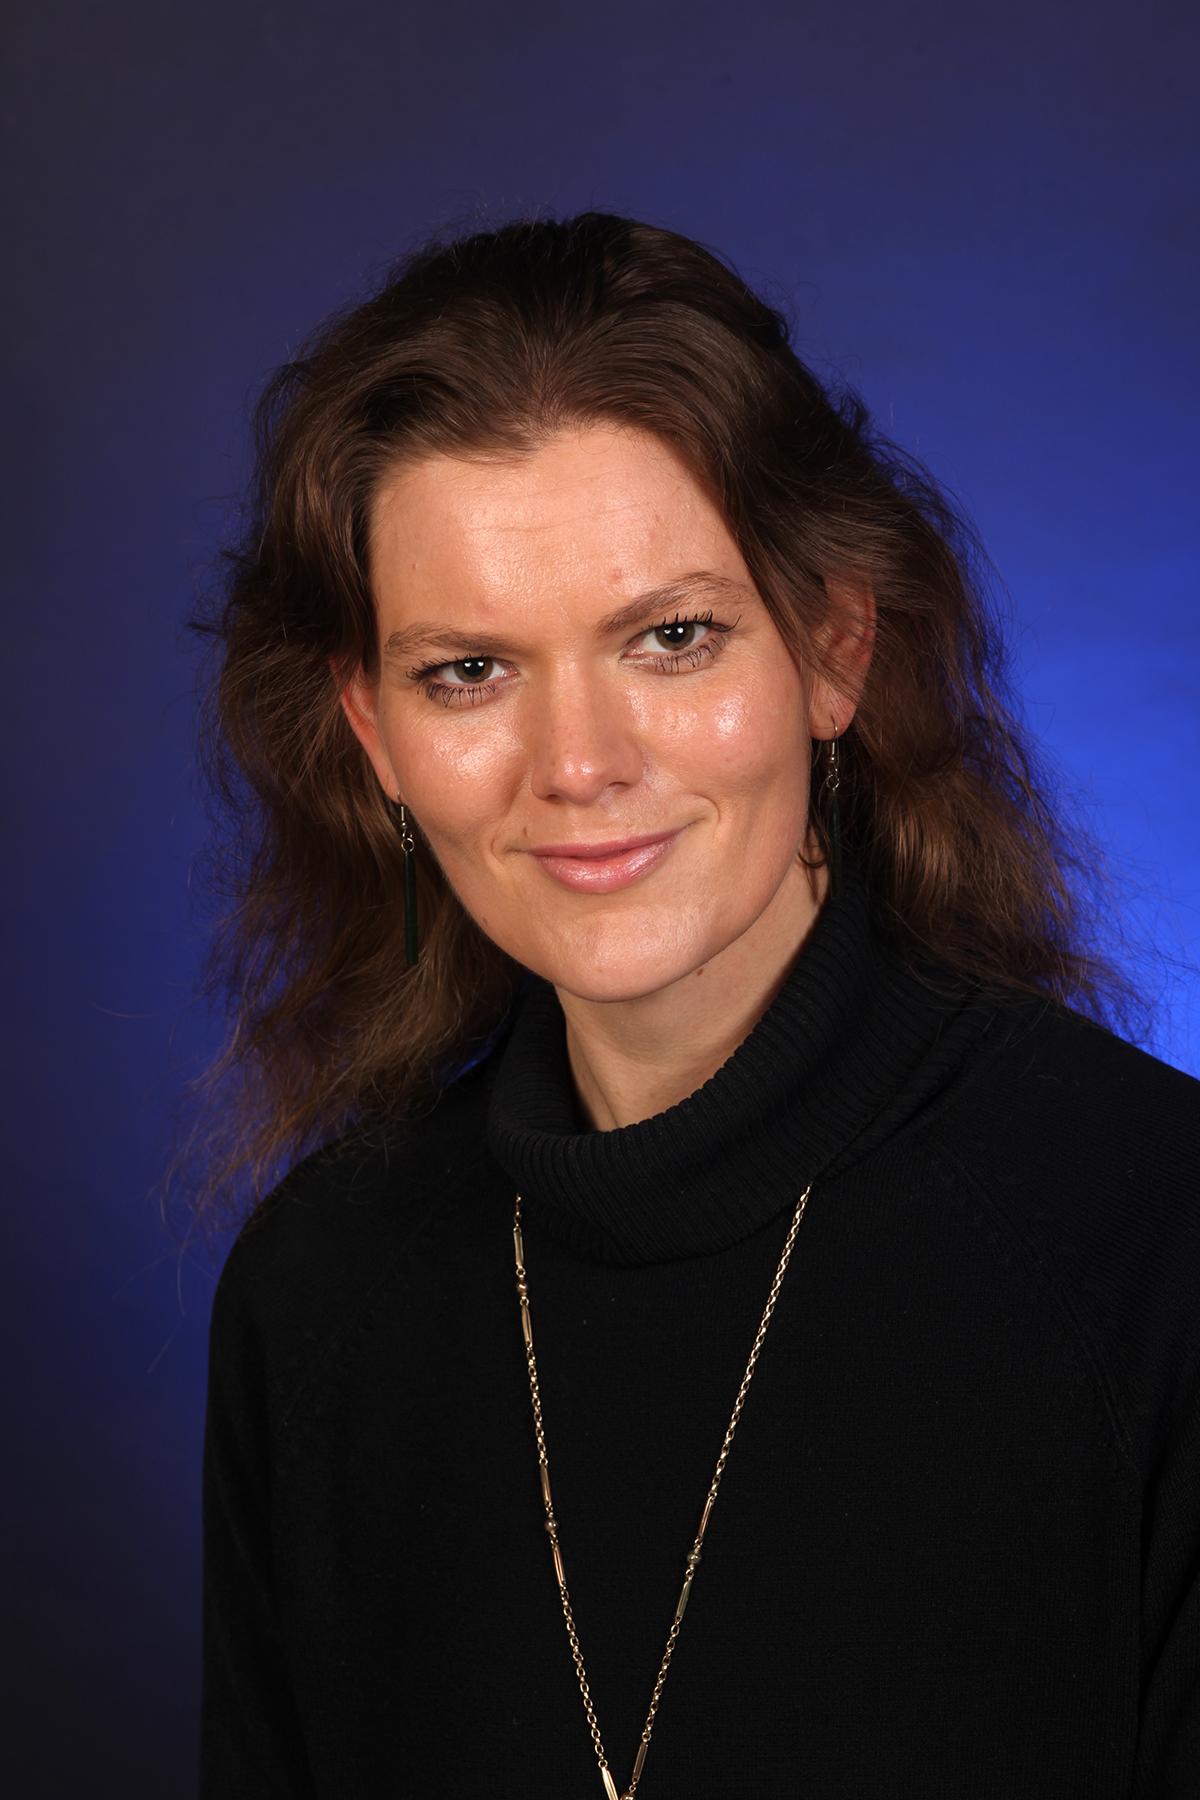 Jennifer Campion